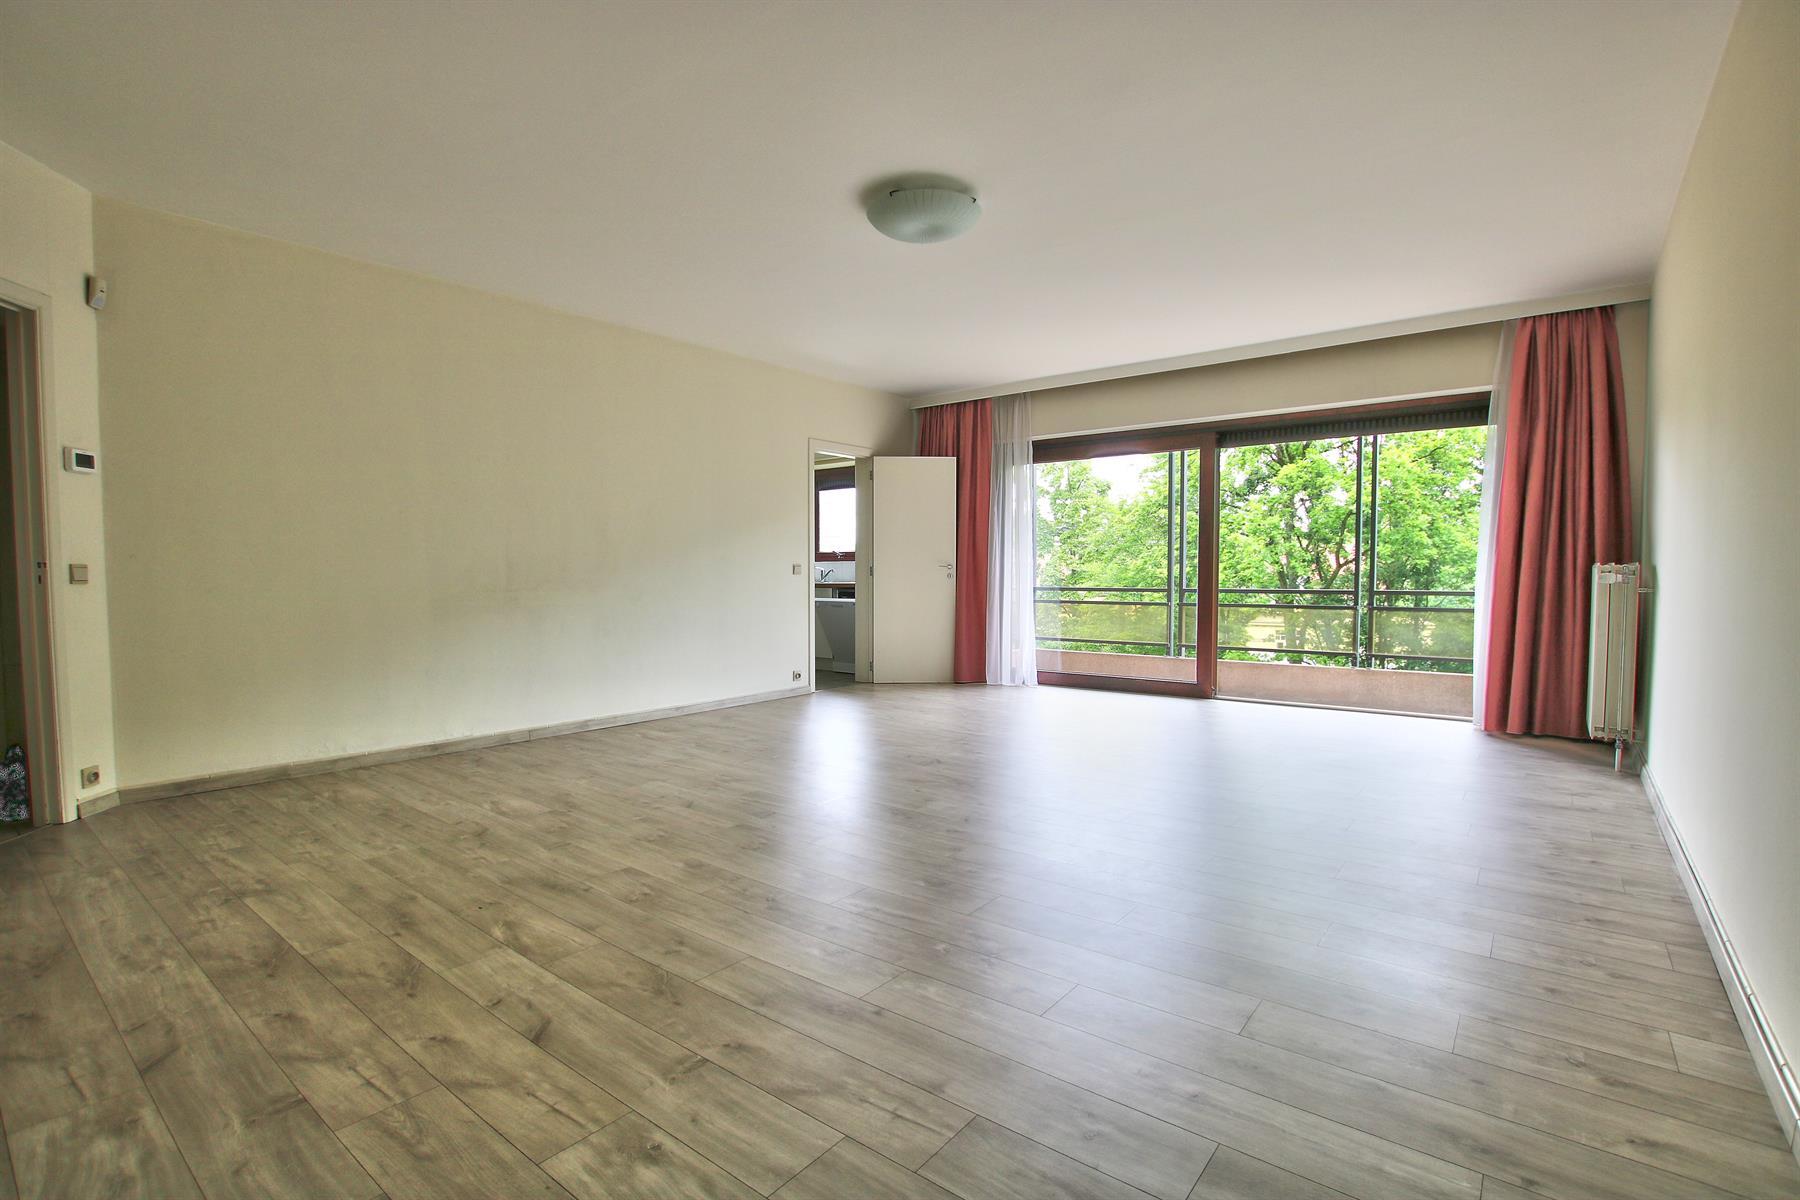 Appartement - Auderghem - #4517295-0